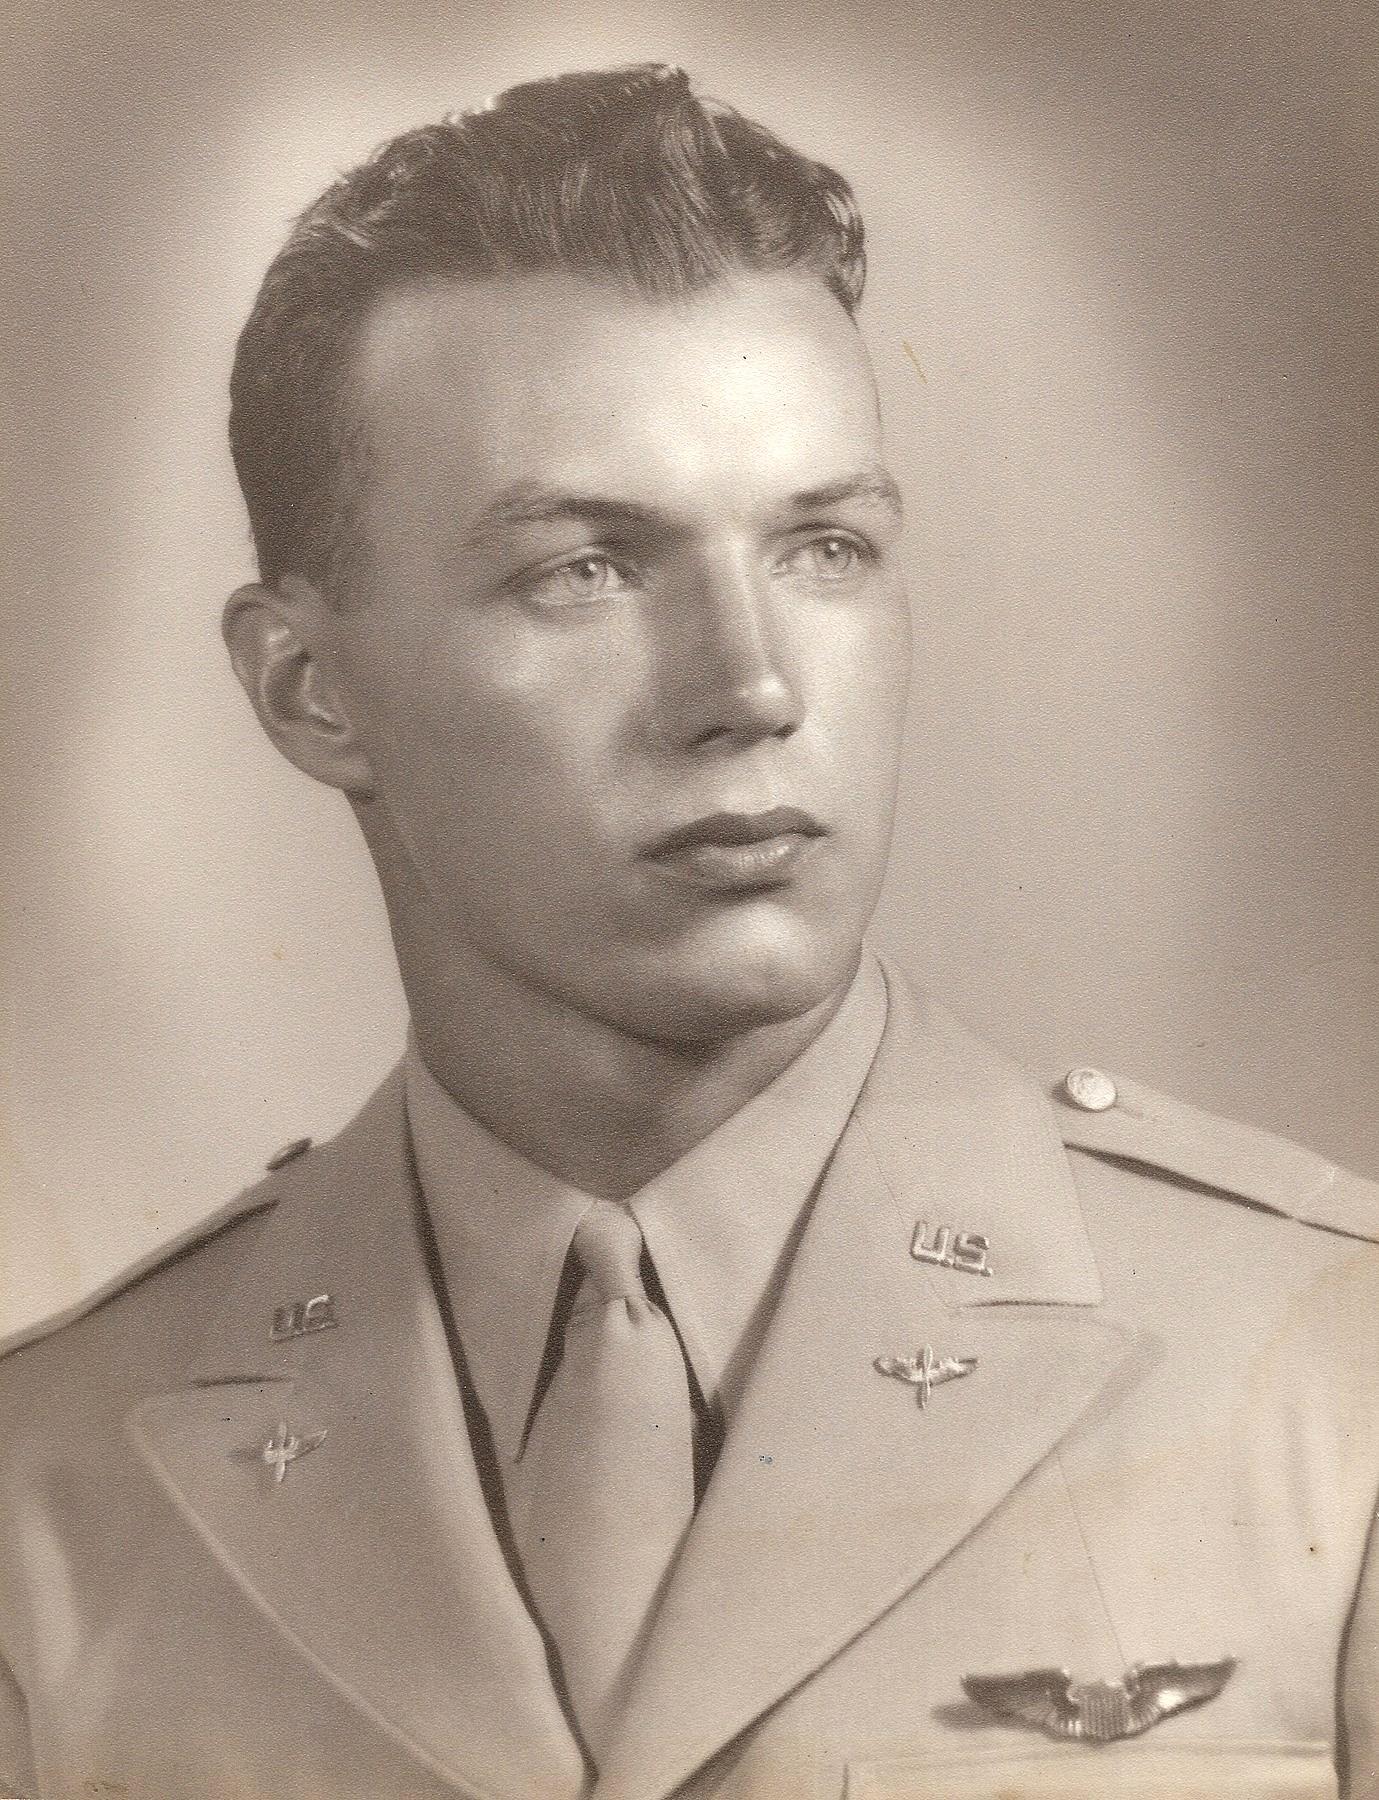 Lewis C Holder Obituary - Dallas, TX